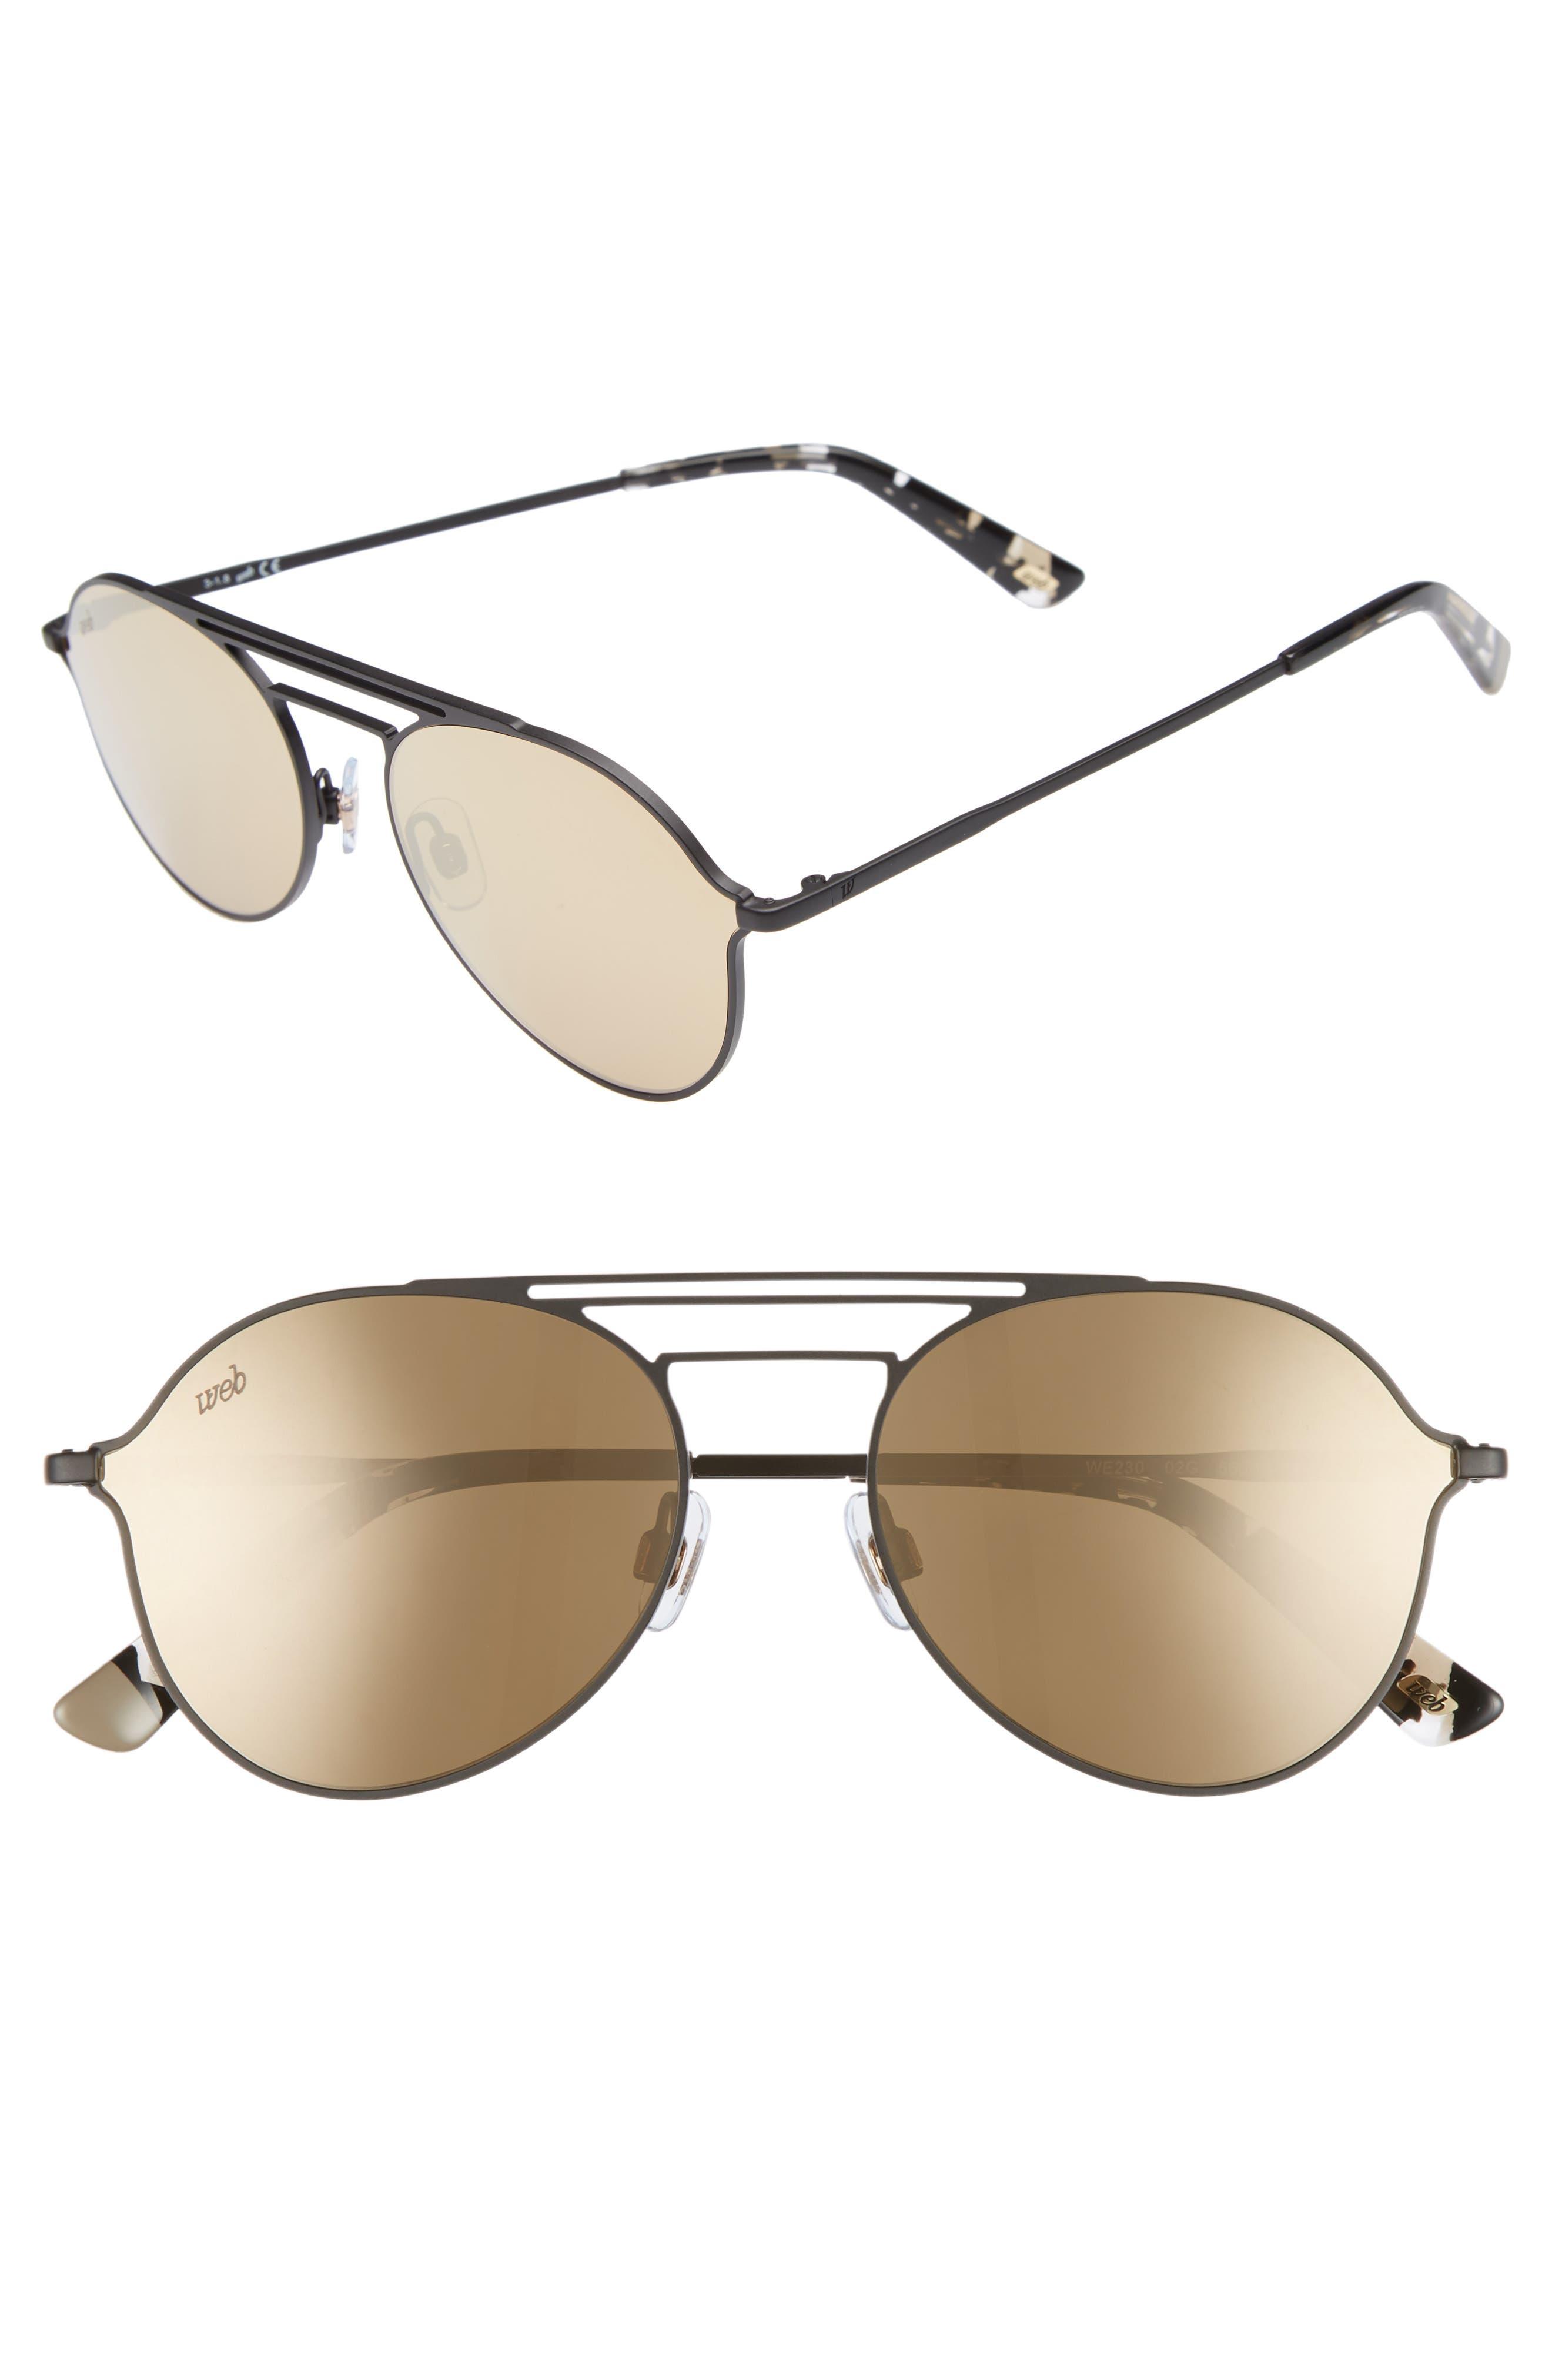 56mm Aviator Sunglasses,                         Main,                         color, MATTE BLACK/ BROWN MIRROR